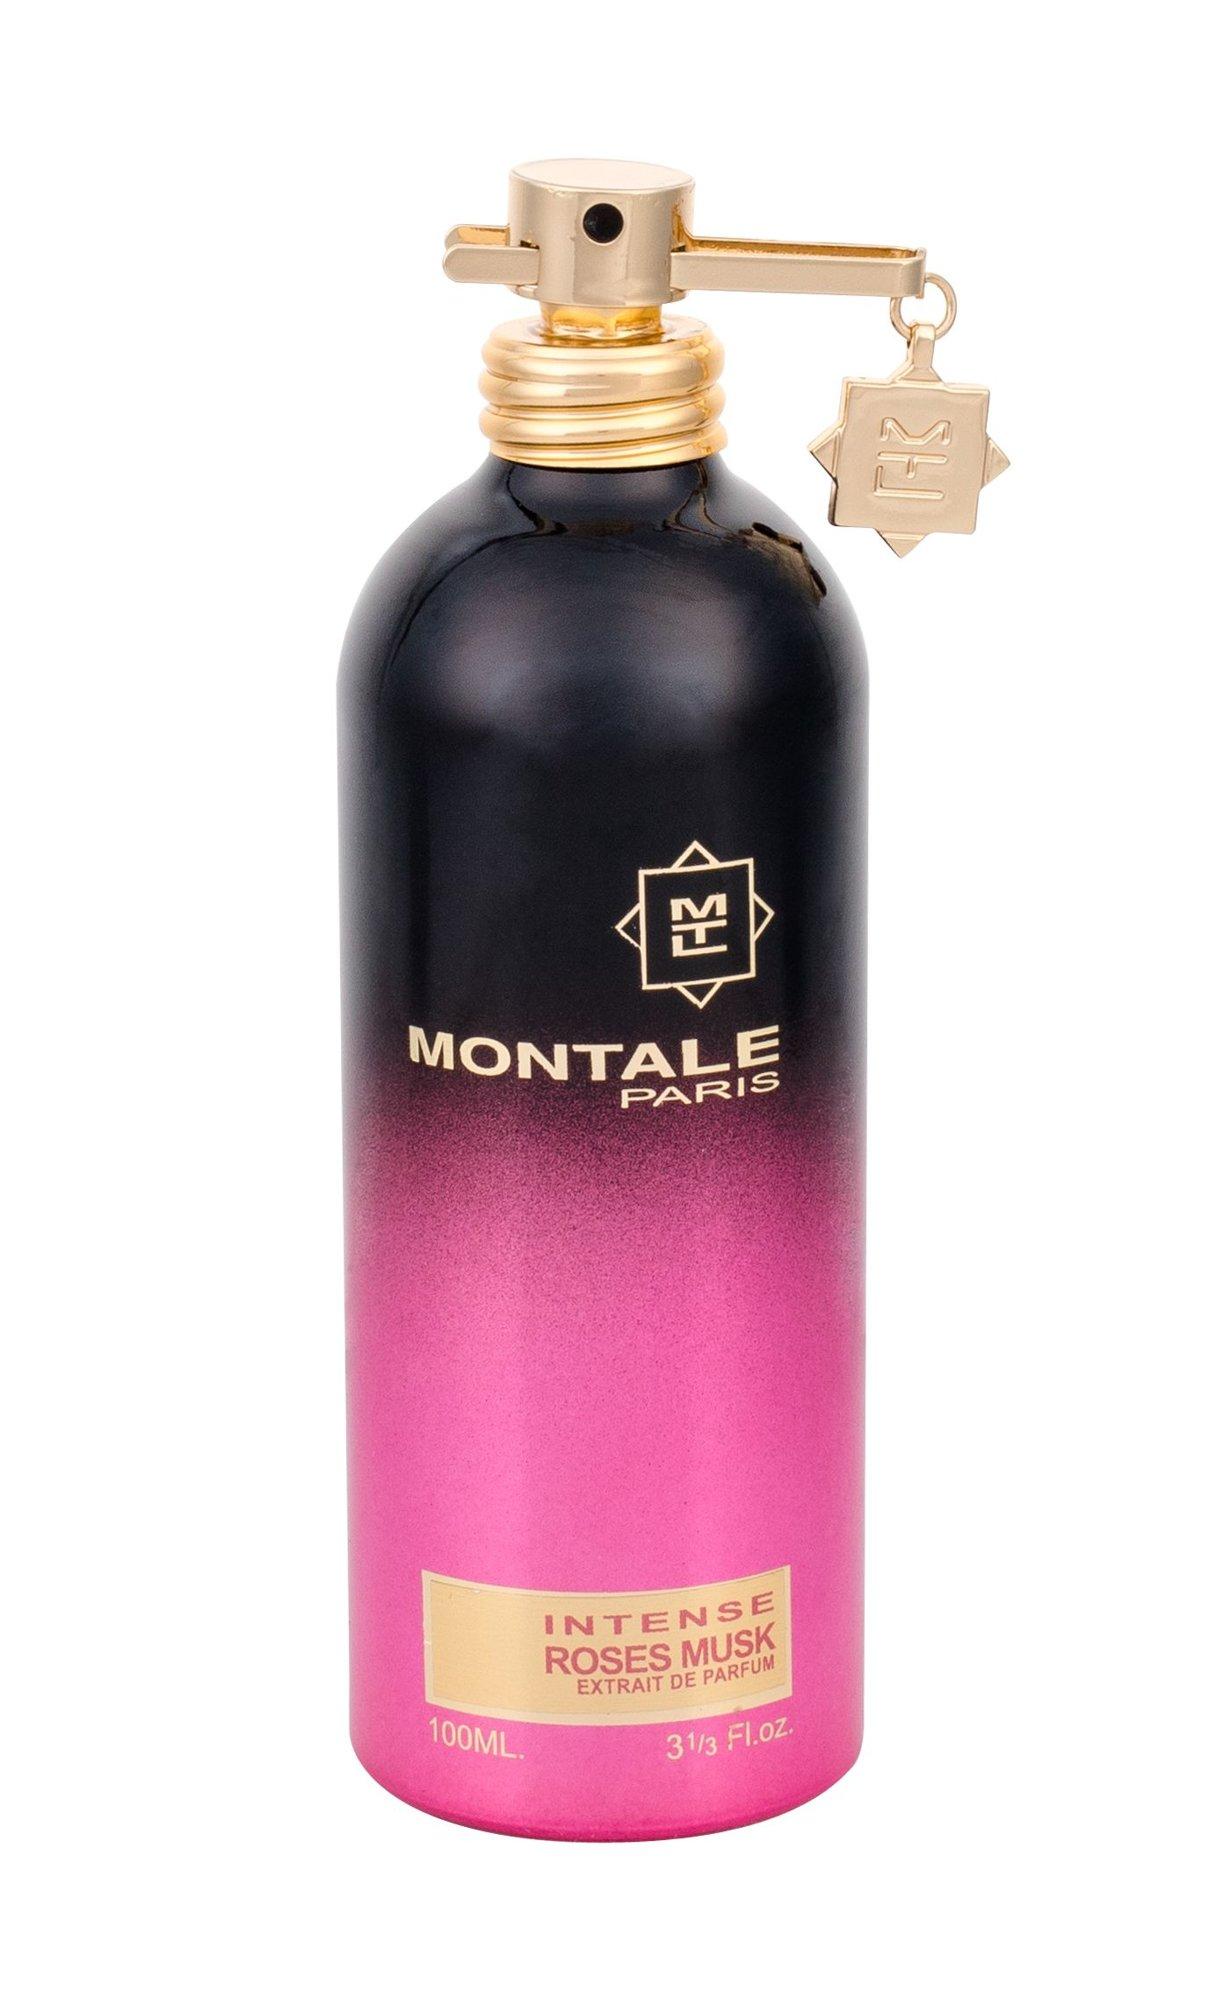 Montale Paris Intense Roses Musk EDP 100ml